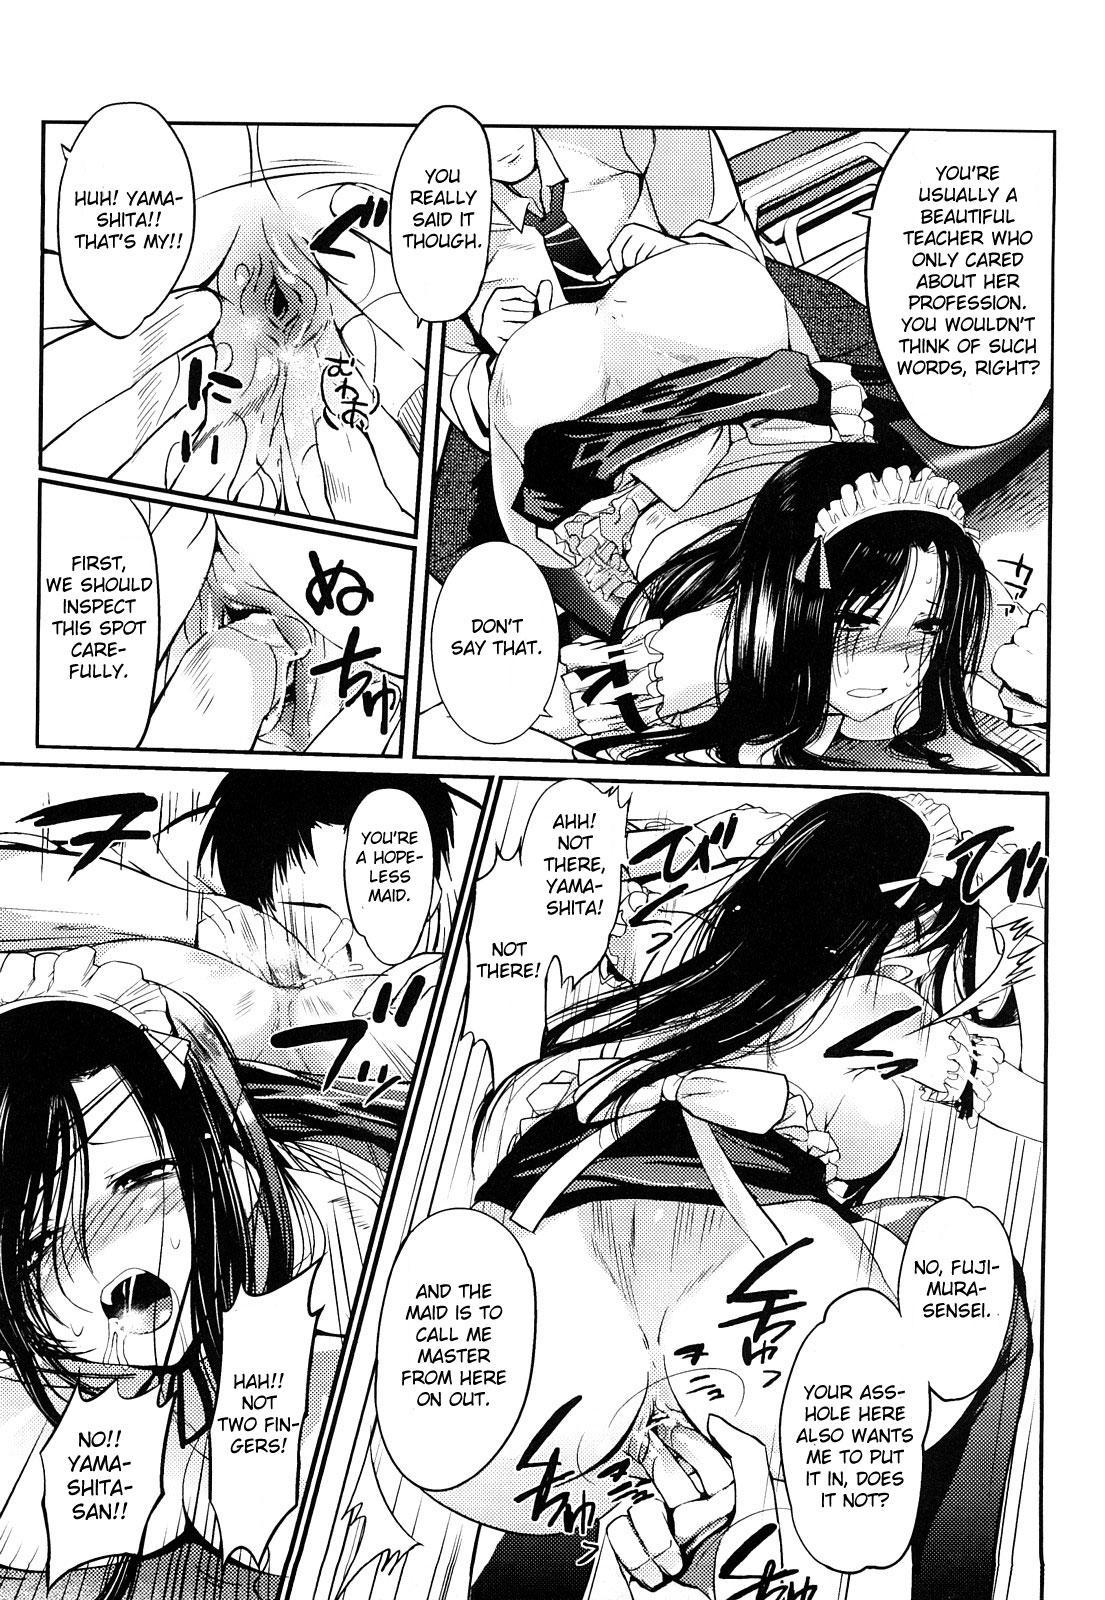 [Hanpera] Onee-san Whisper - Erotic Wisper [English] [CGRascal] [Decensored] 50